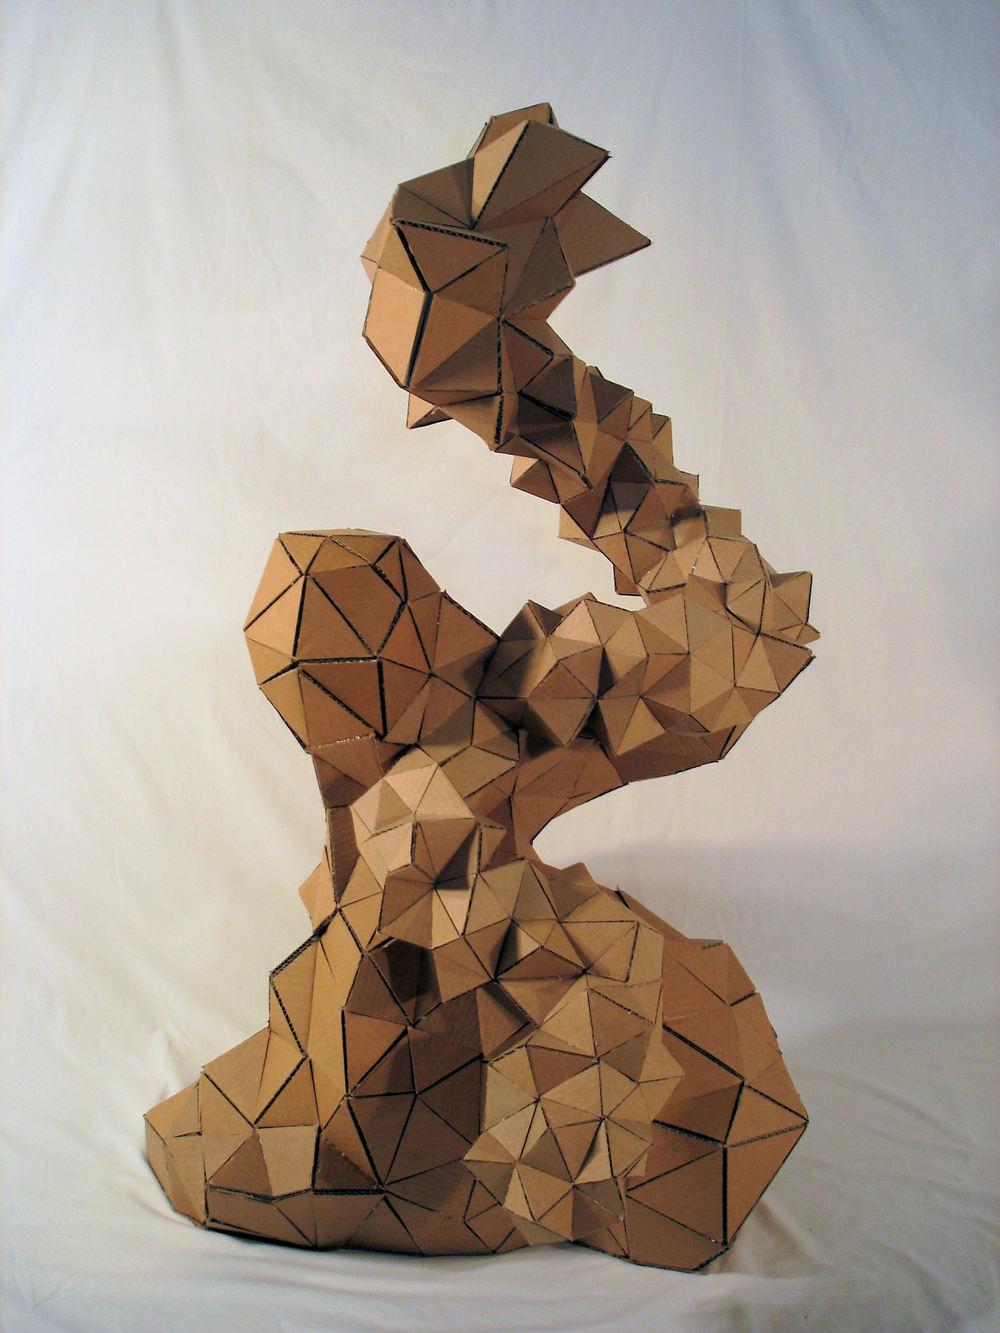 """Vibrato""  newspaper, cardboard, glue  48"" x 28"" x 30""  2006"